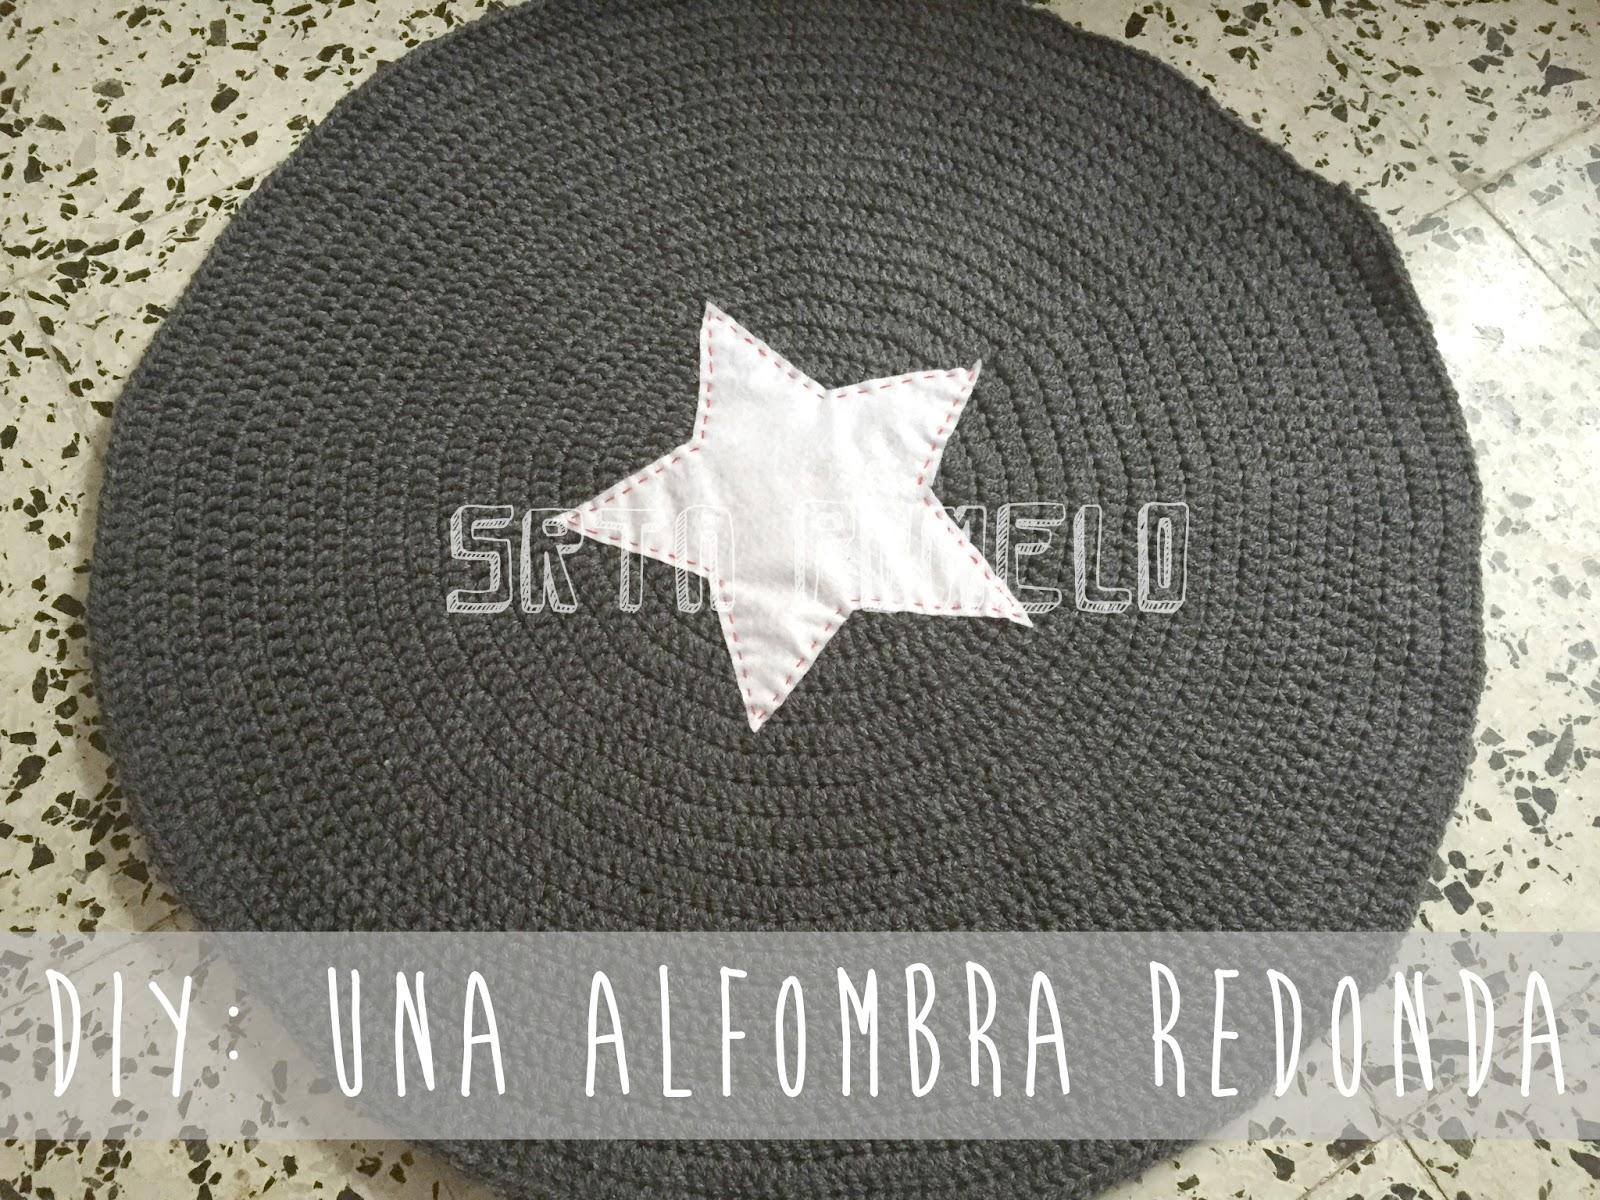 Srta pomelo diy una alfombra redonda tejida a crochet - Alfombras redondas ...